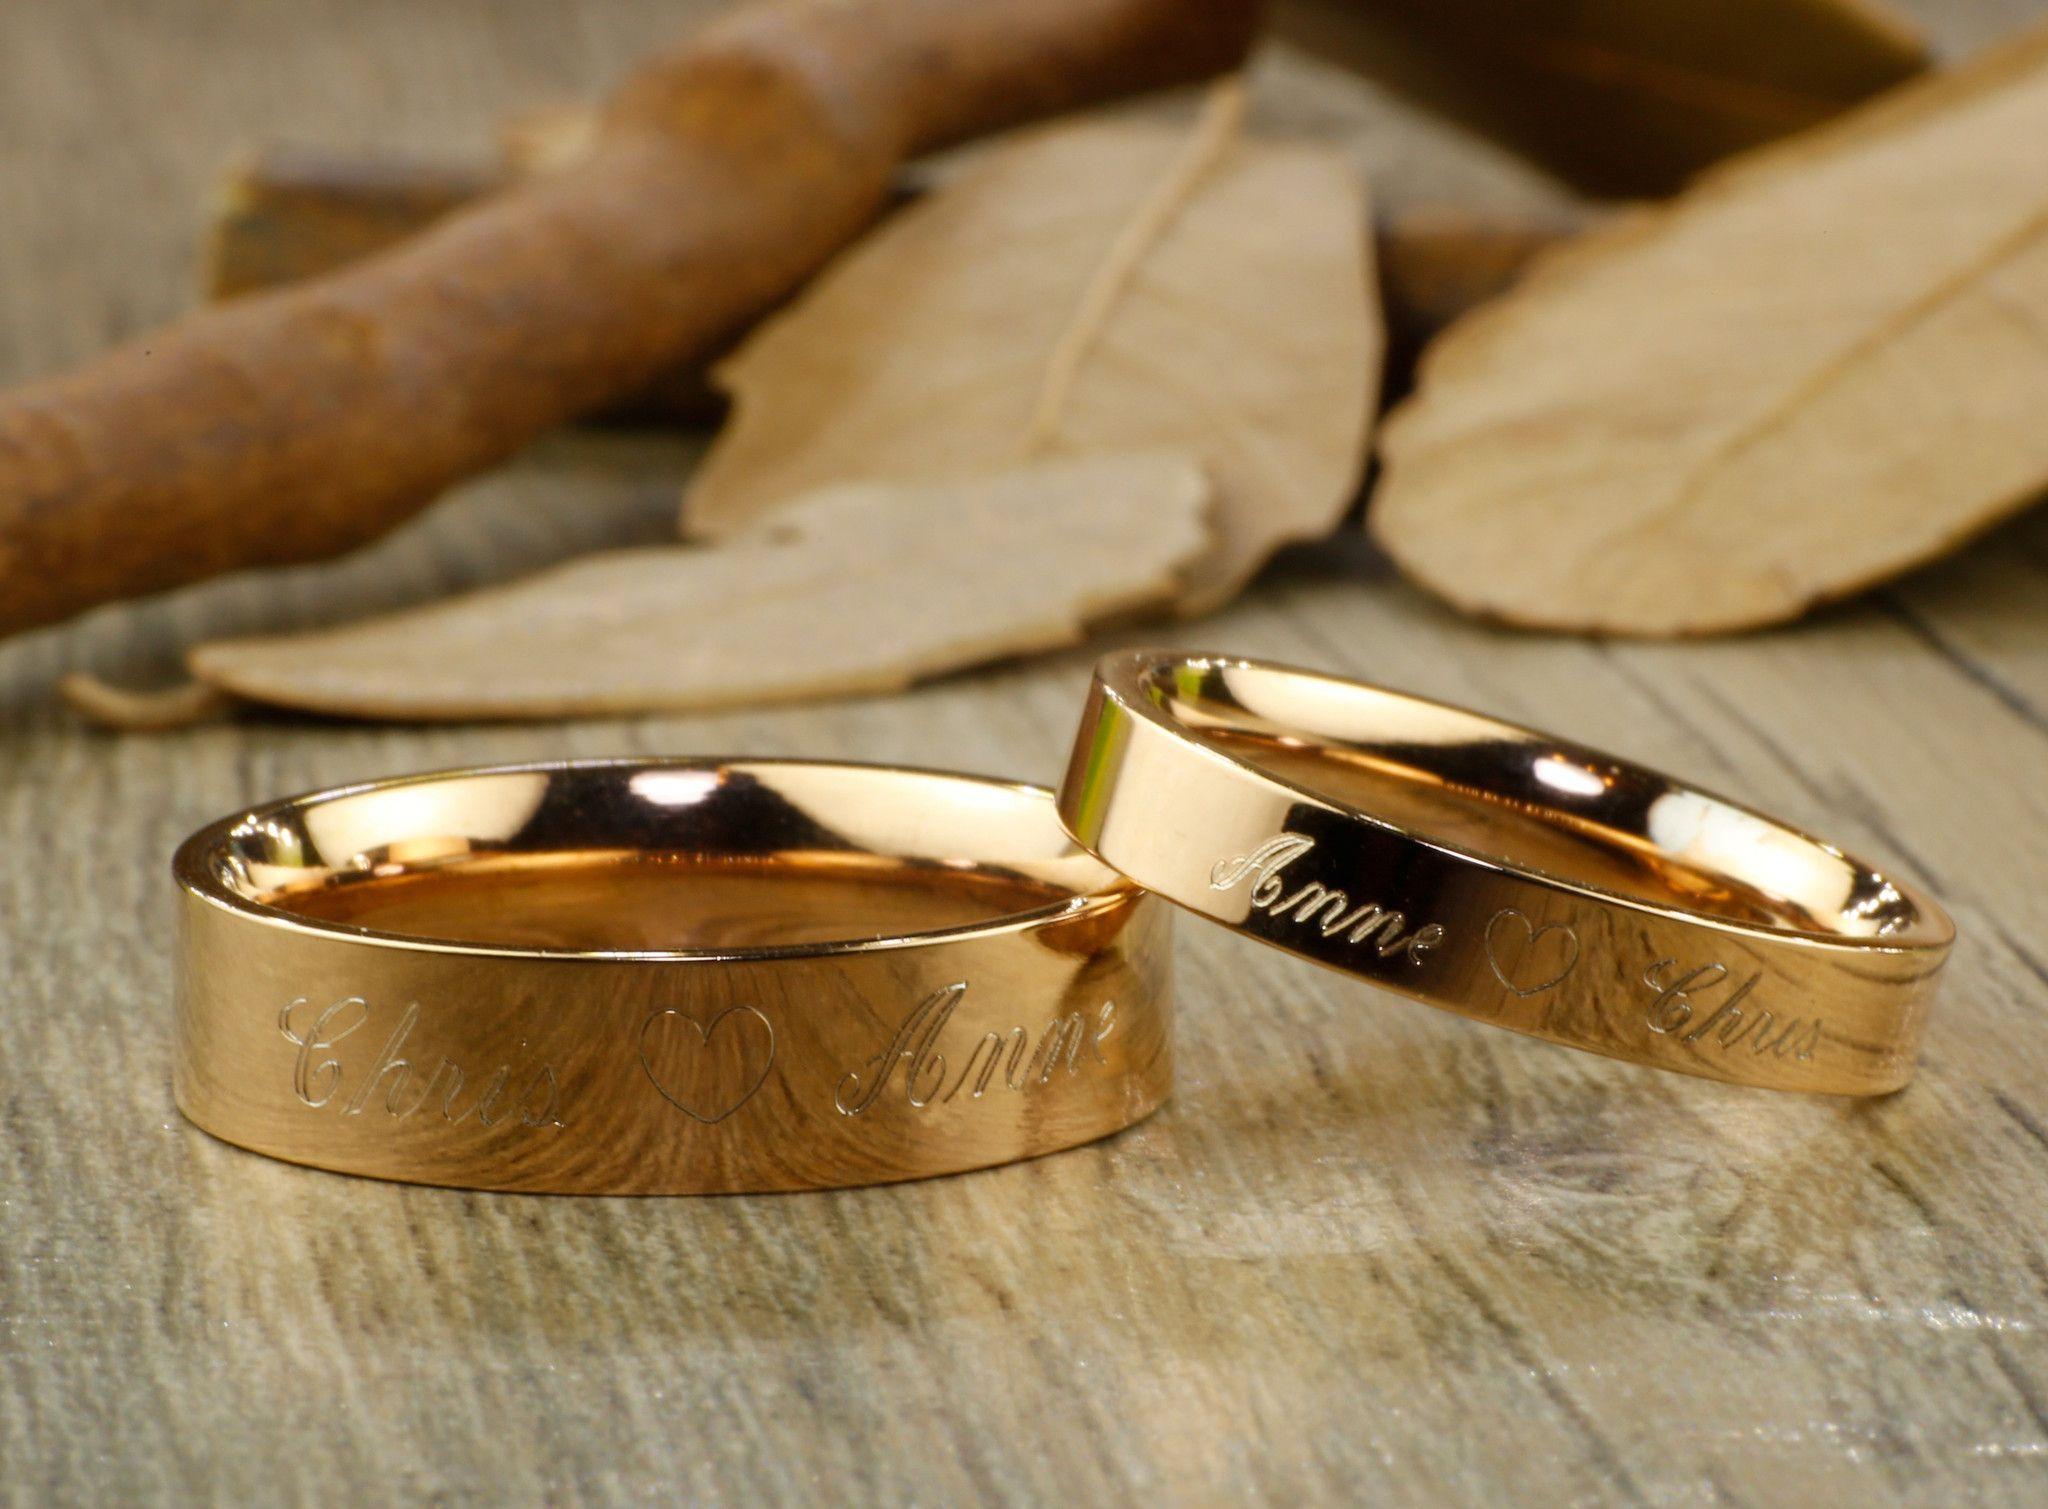 Custom Elvish Tengwar Lord Of The Rings Rose Gold Flat Matching Wedding Bands Couple Rings Set Titanium Rings Set Anniversary Rings Set Couples Ring Set Anniversary Ring Set Titanium Ring Set